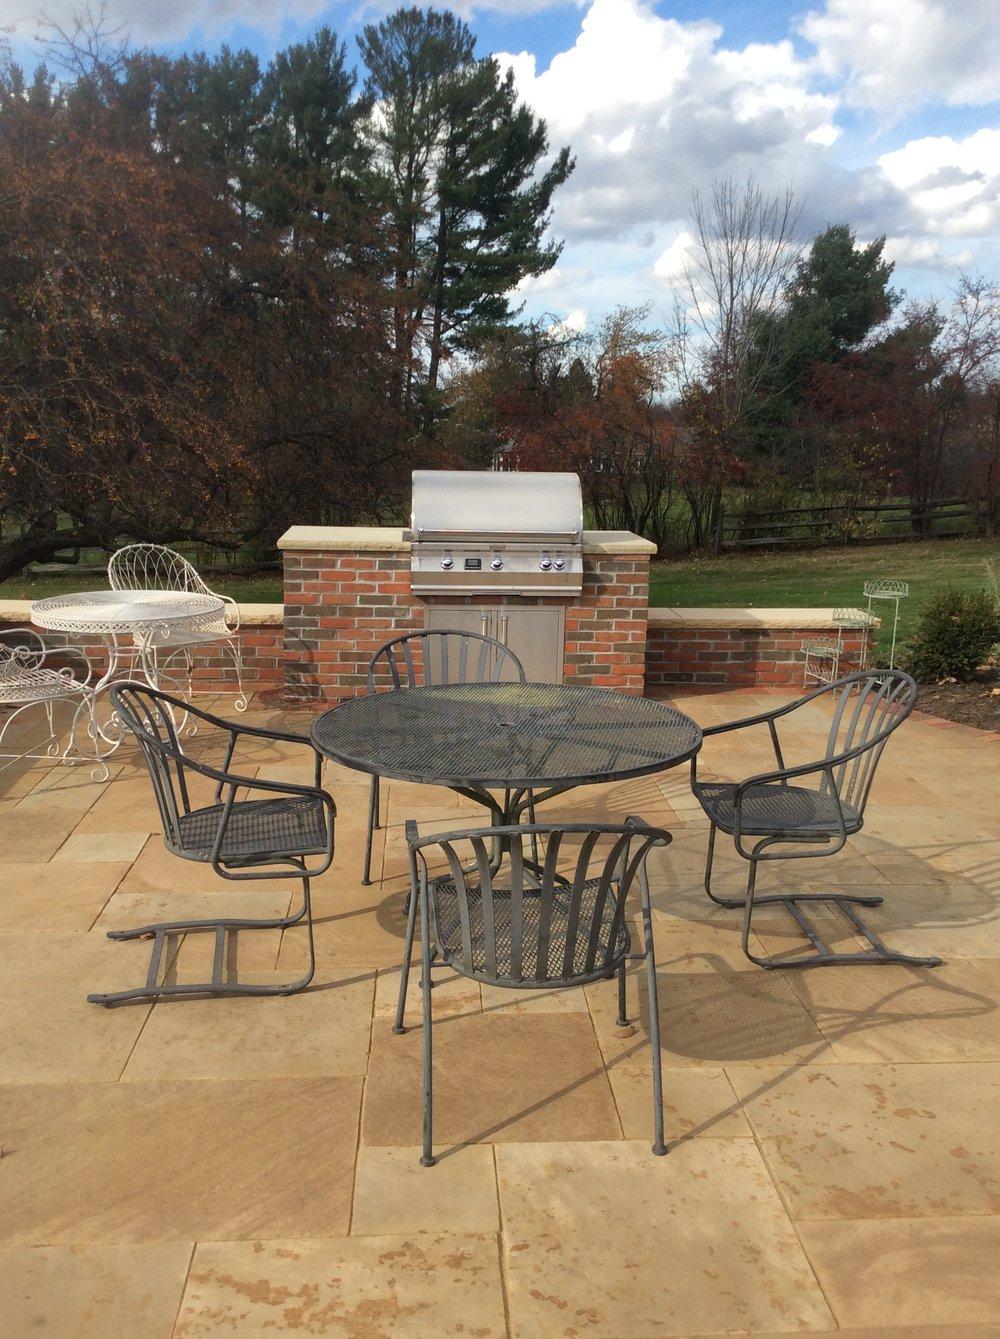 Landscape design with Unilock patio pavers in Bainbridge Township, OH